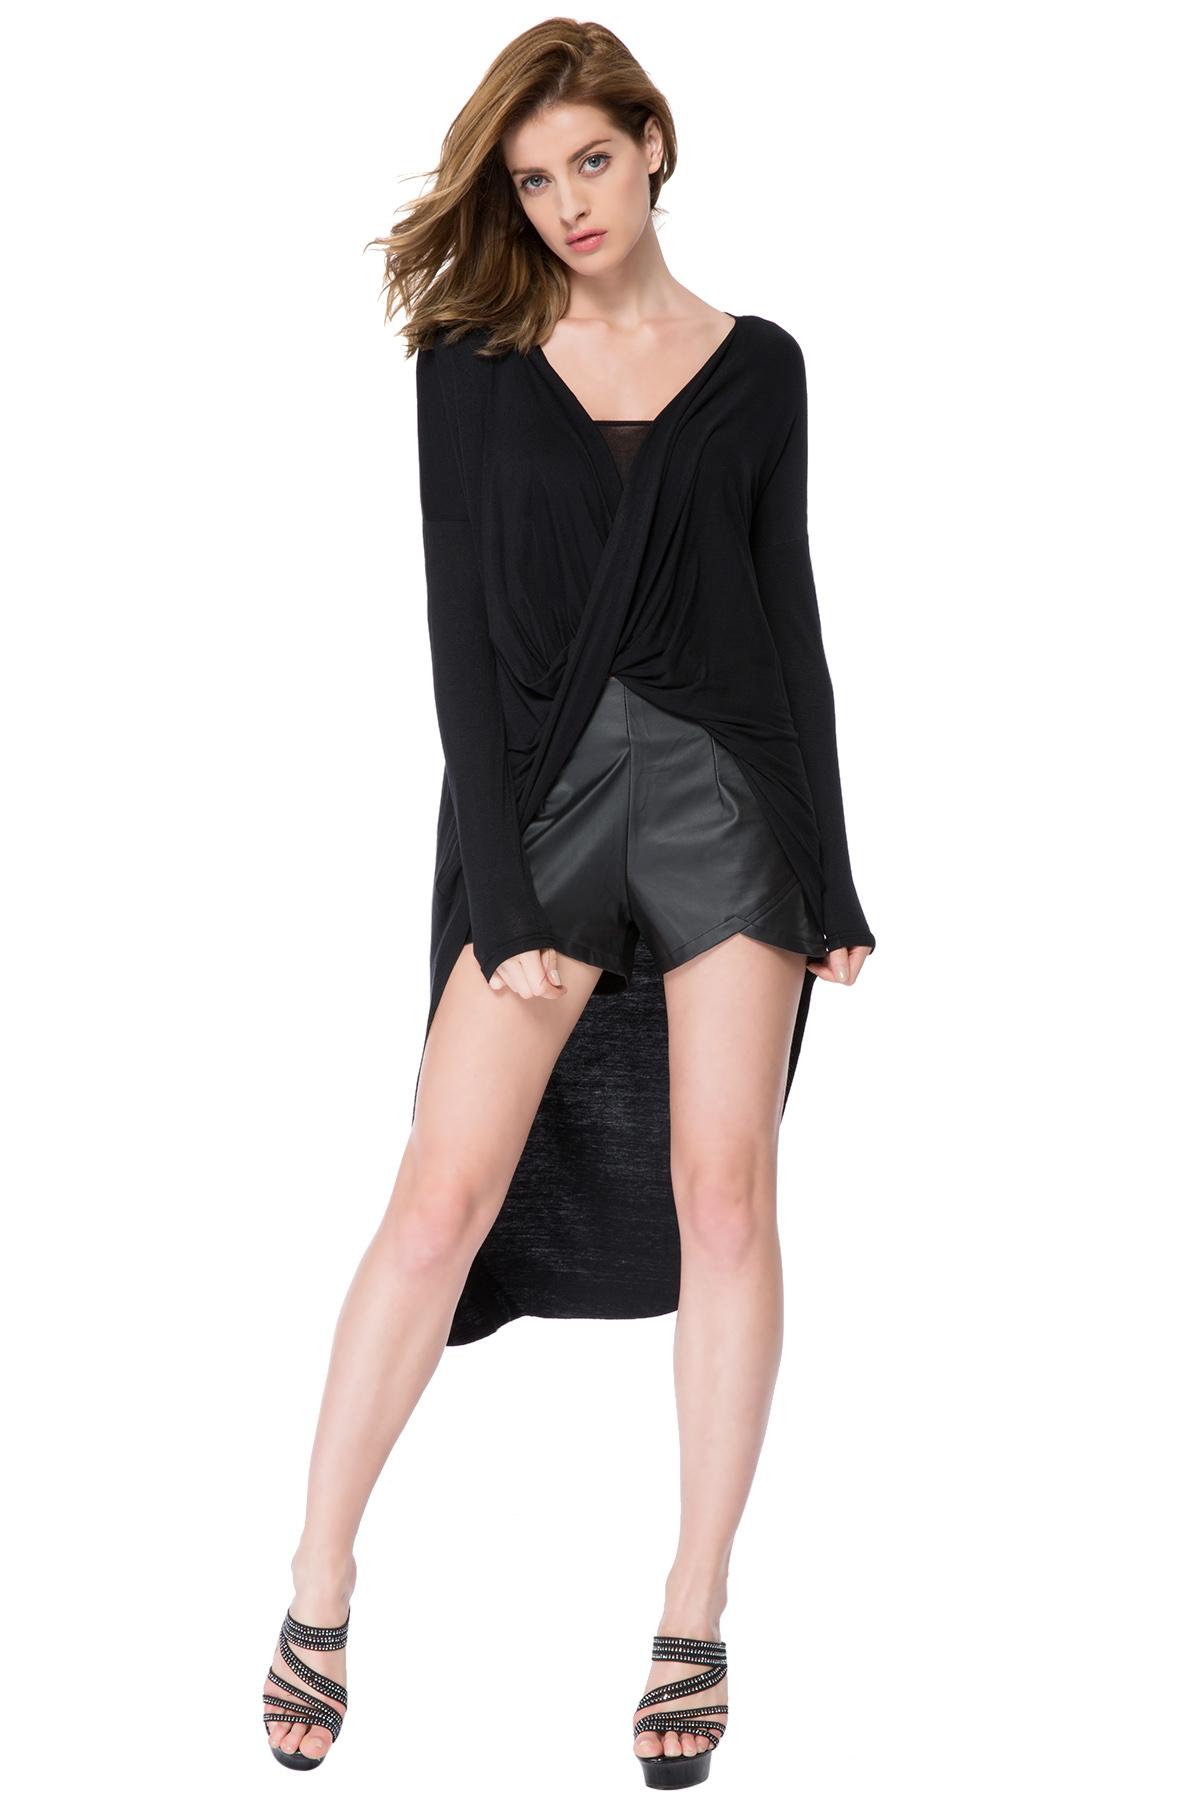 Buy Black V-Neck High-Low Hem Blouse BLACK XL